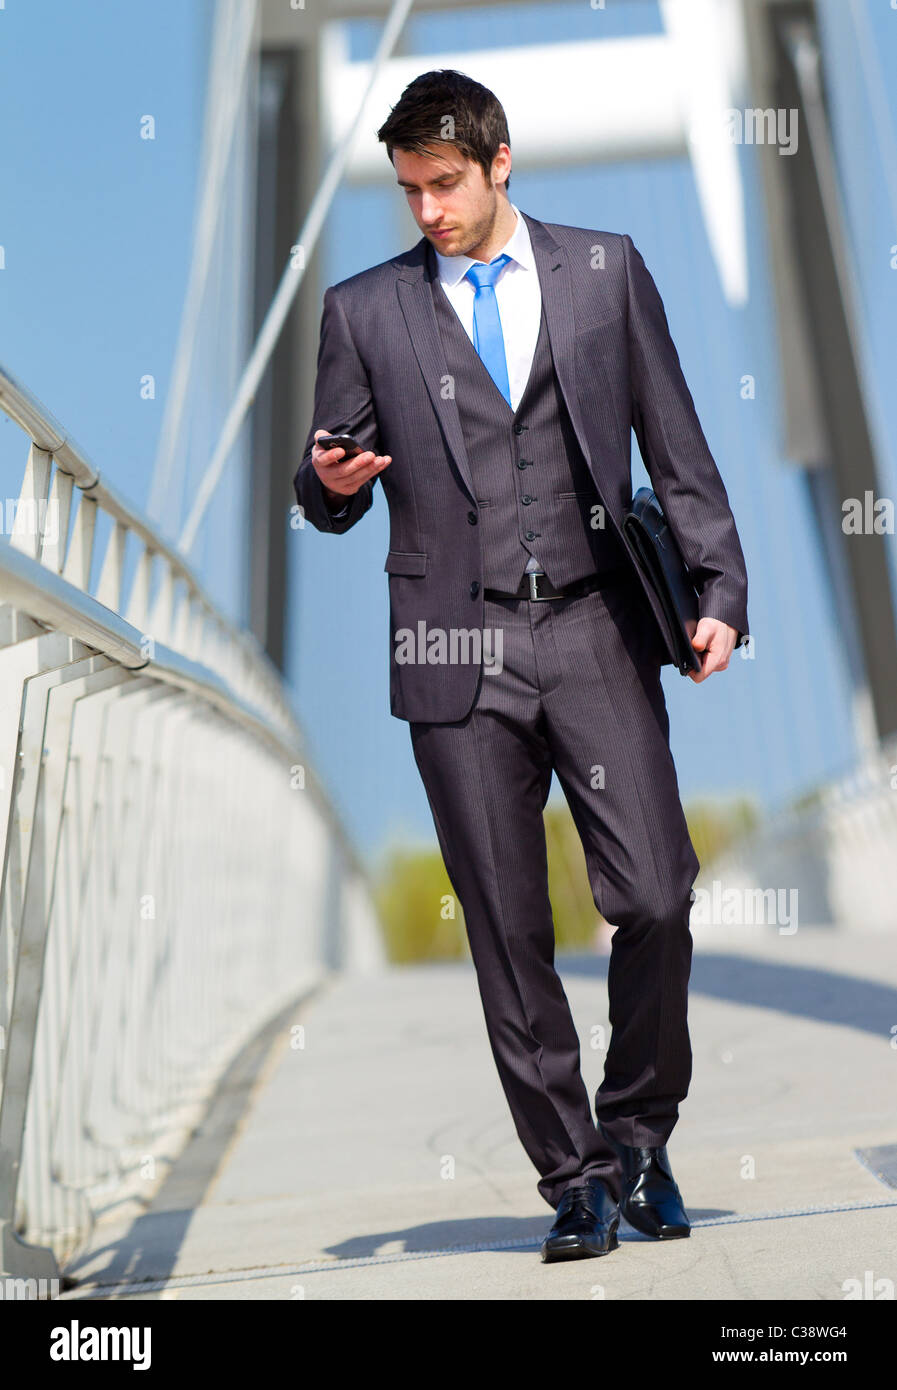 Hombre caminando mirando al teléfono Imagen De Stock